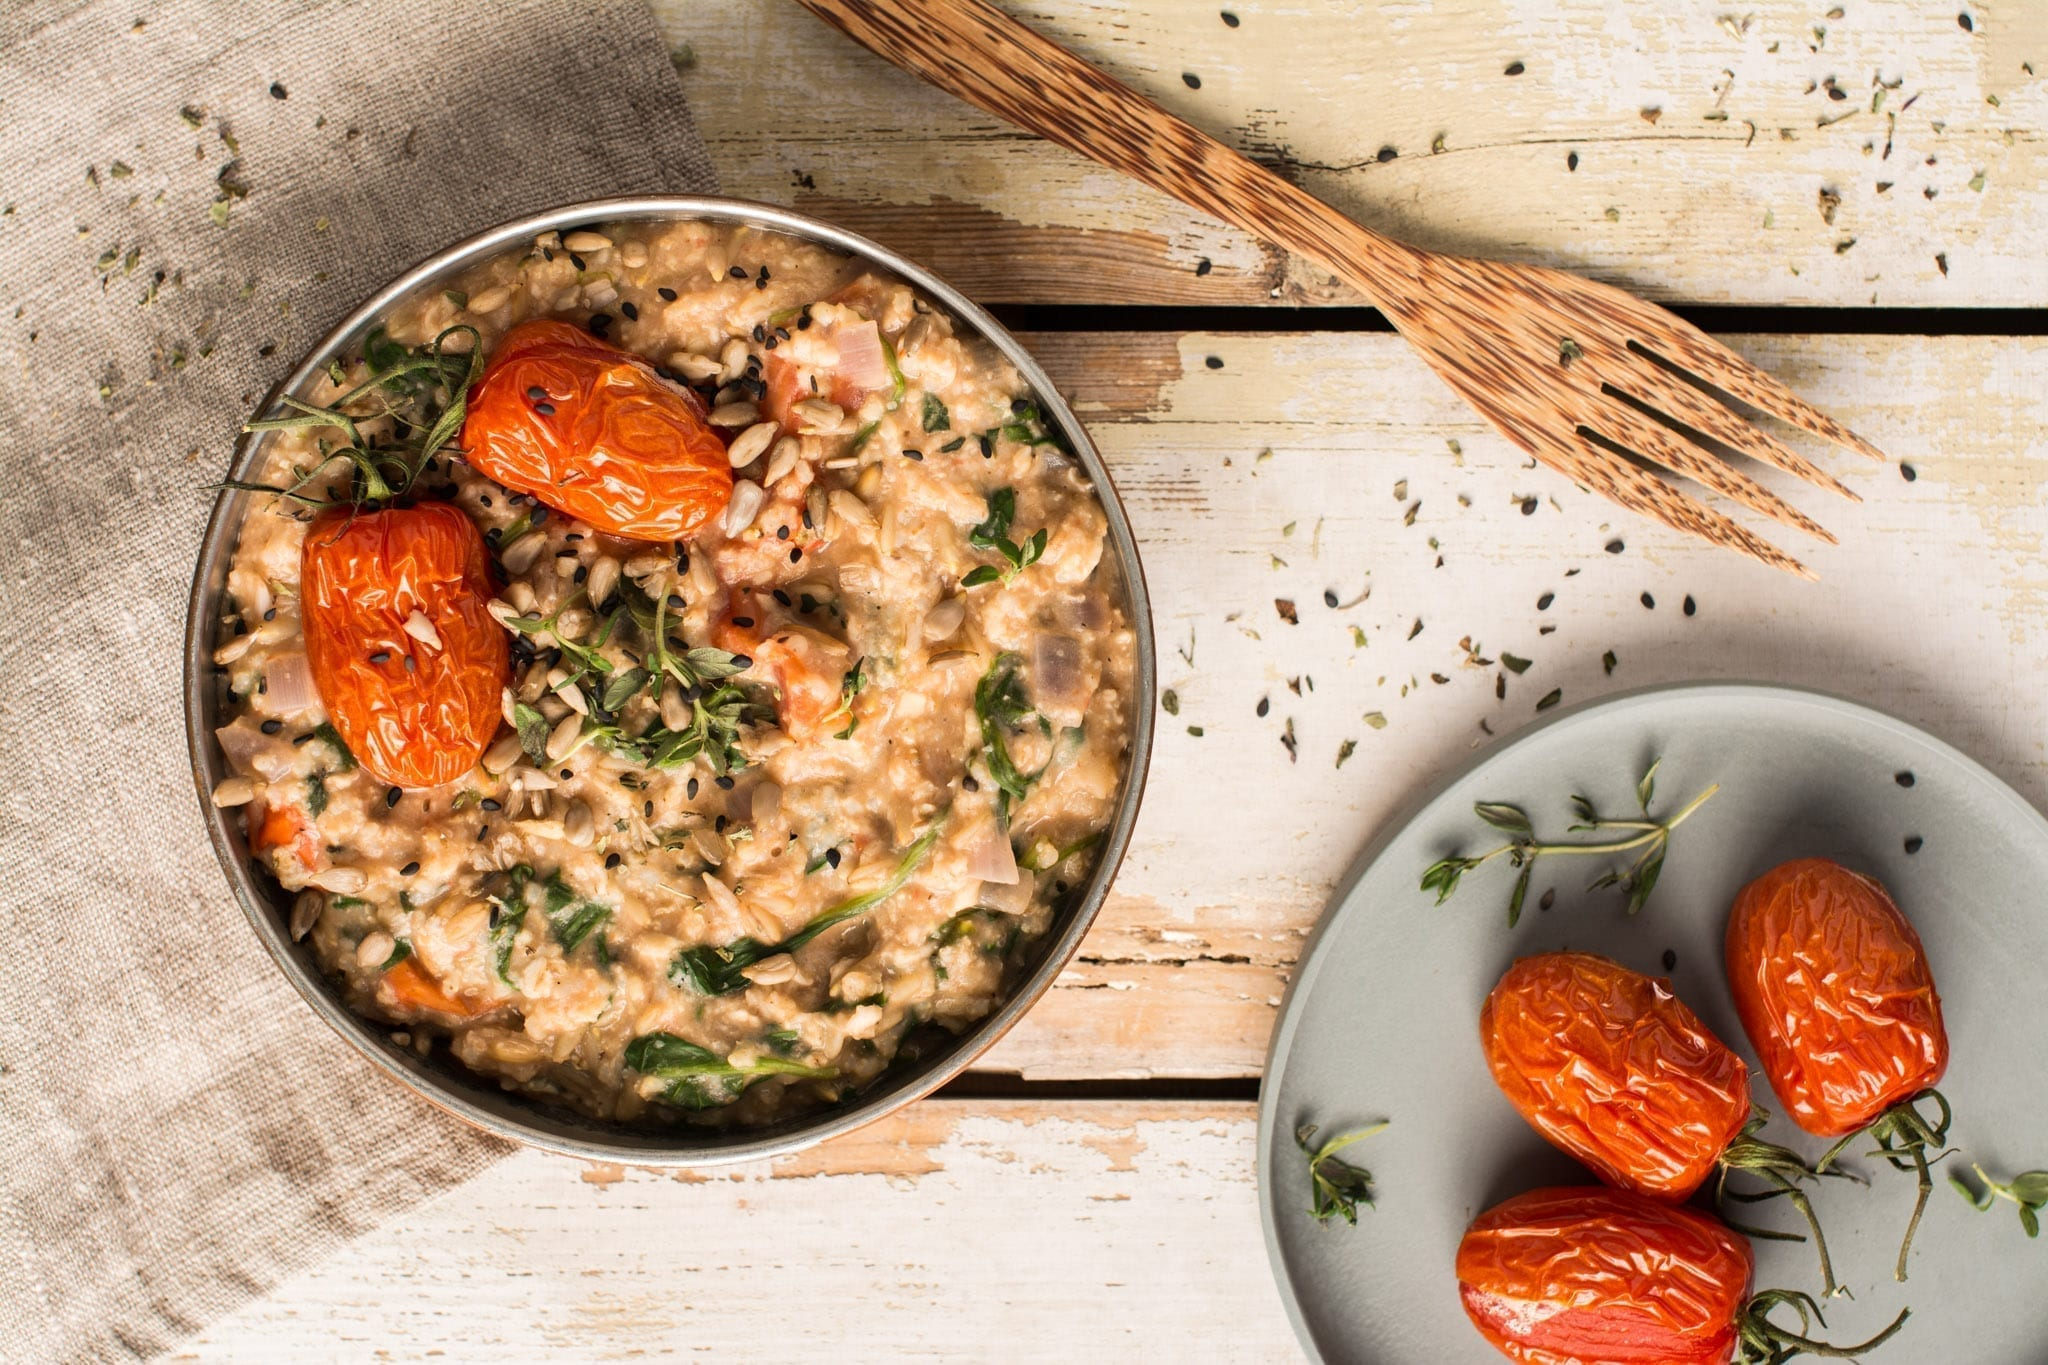 Mediterranean Savory Oatmeal with Millet   Nutriplanet